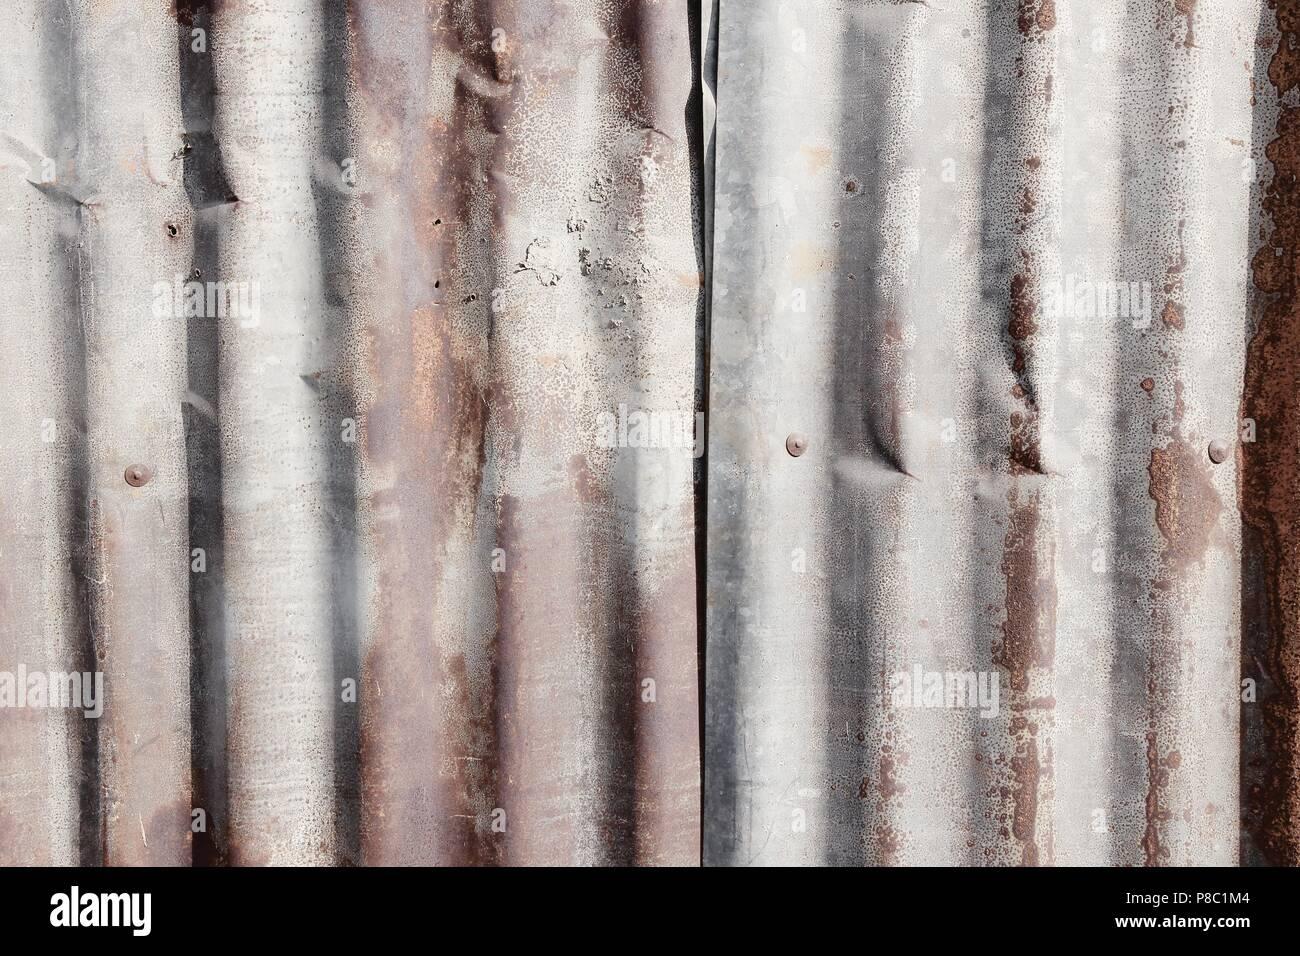 Galvanized metal texture - grungy old steel tin. - Stock Image